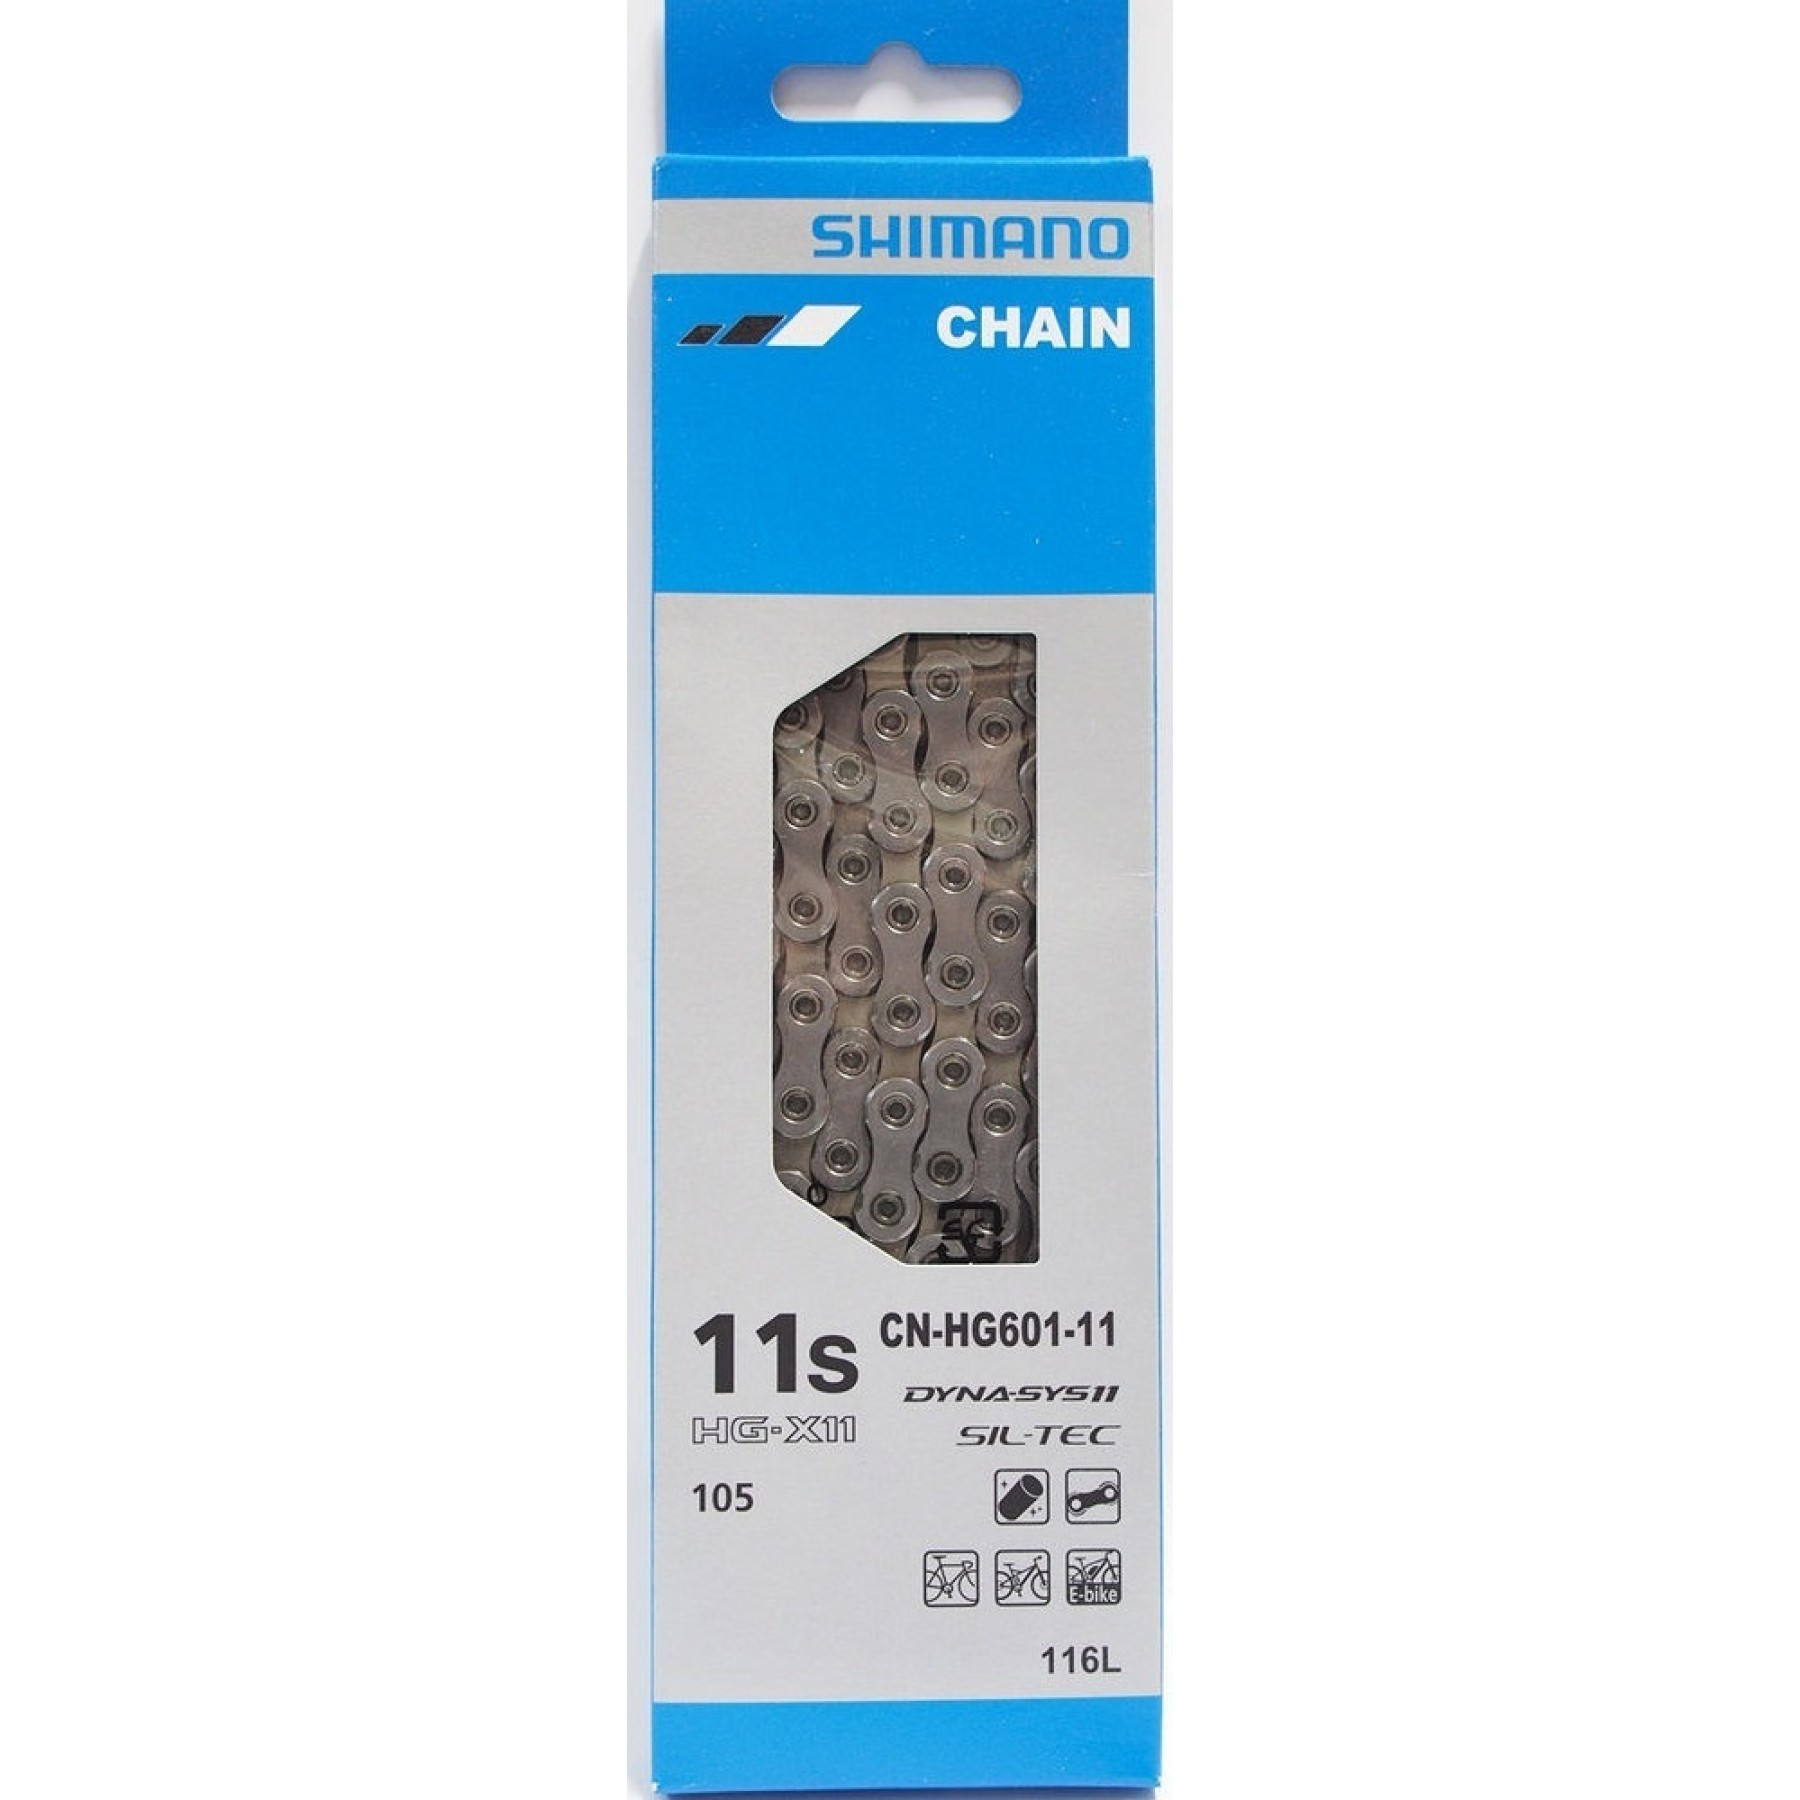 Shimano 105 CNHG601,11SPD,114L